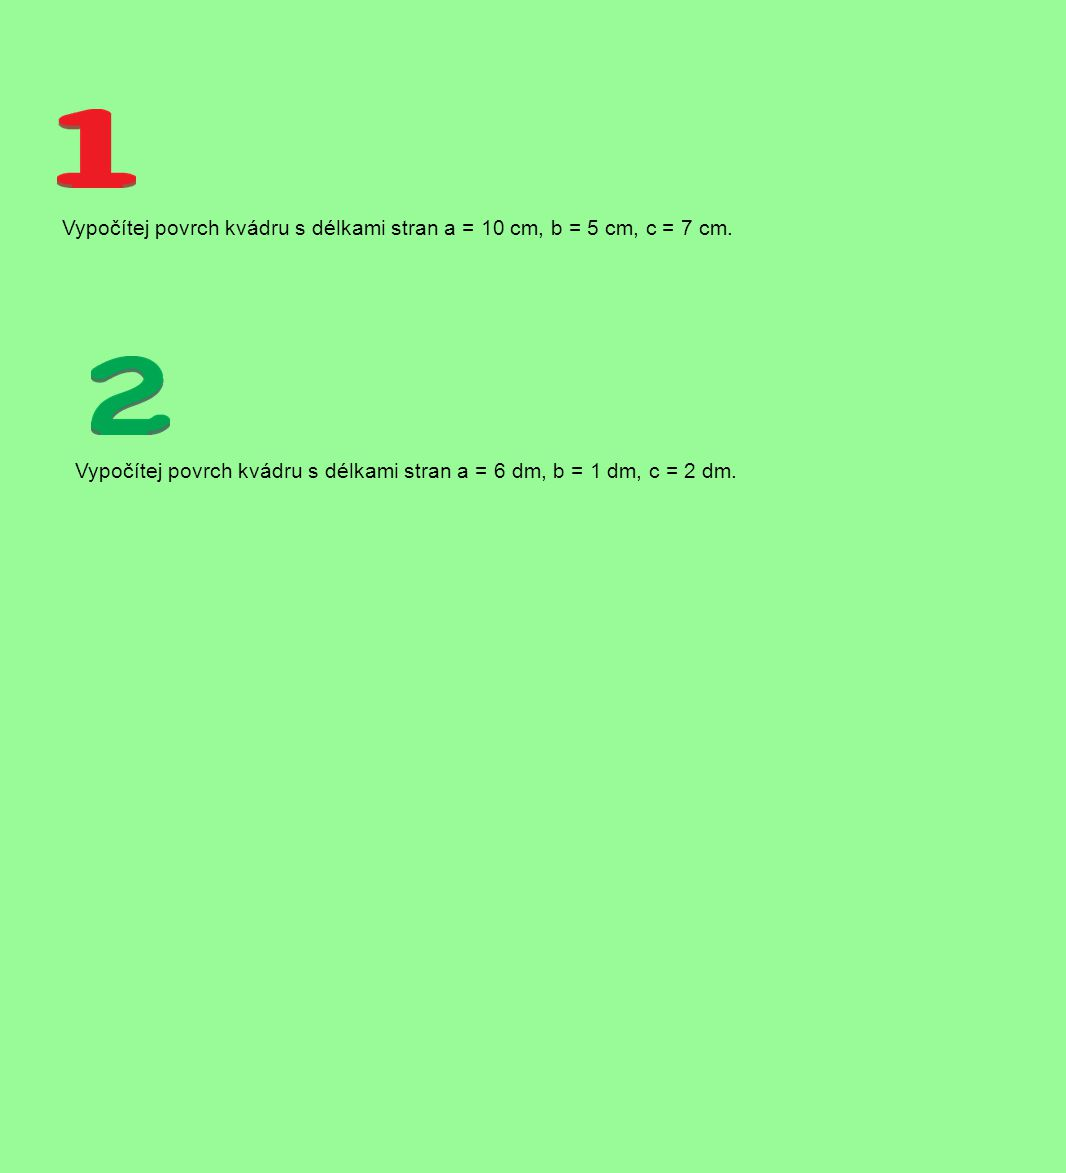 Vypočítej povrch kvádru s délkami stran a = 10 cm, b = 5 cm, c = 7 cm.